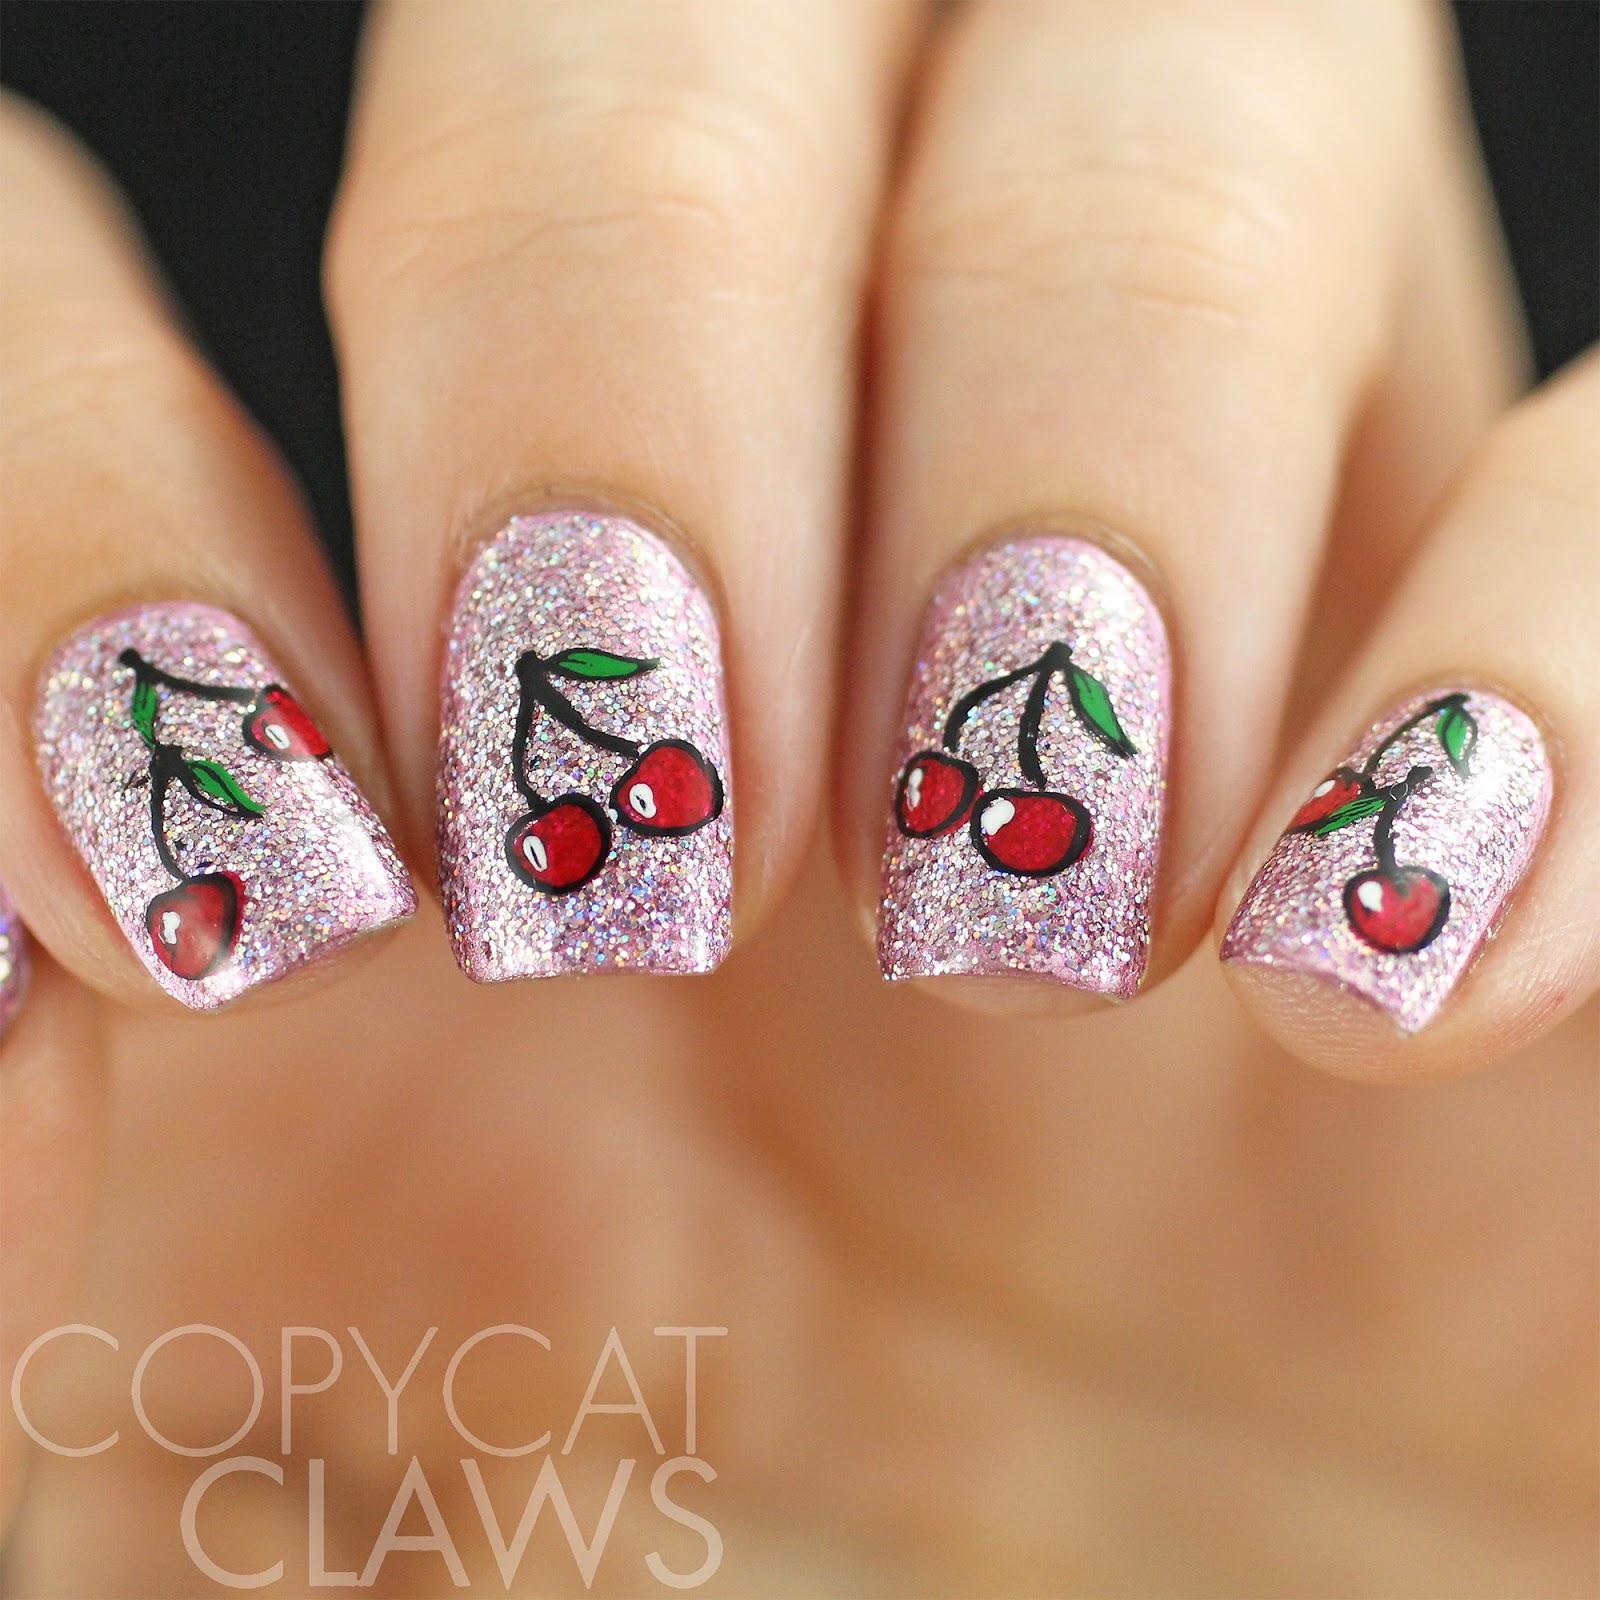 Copycat Claws: HPB Presents Cherry Nail Art